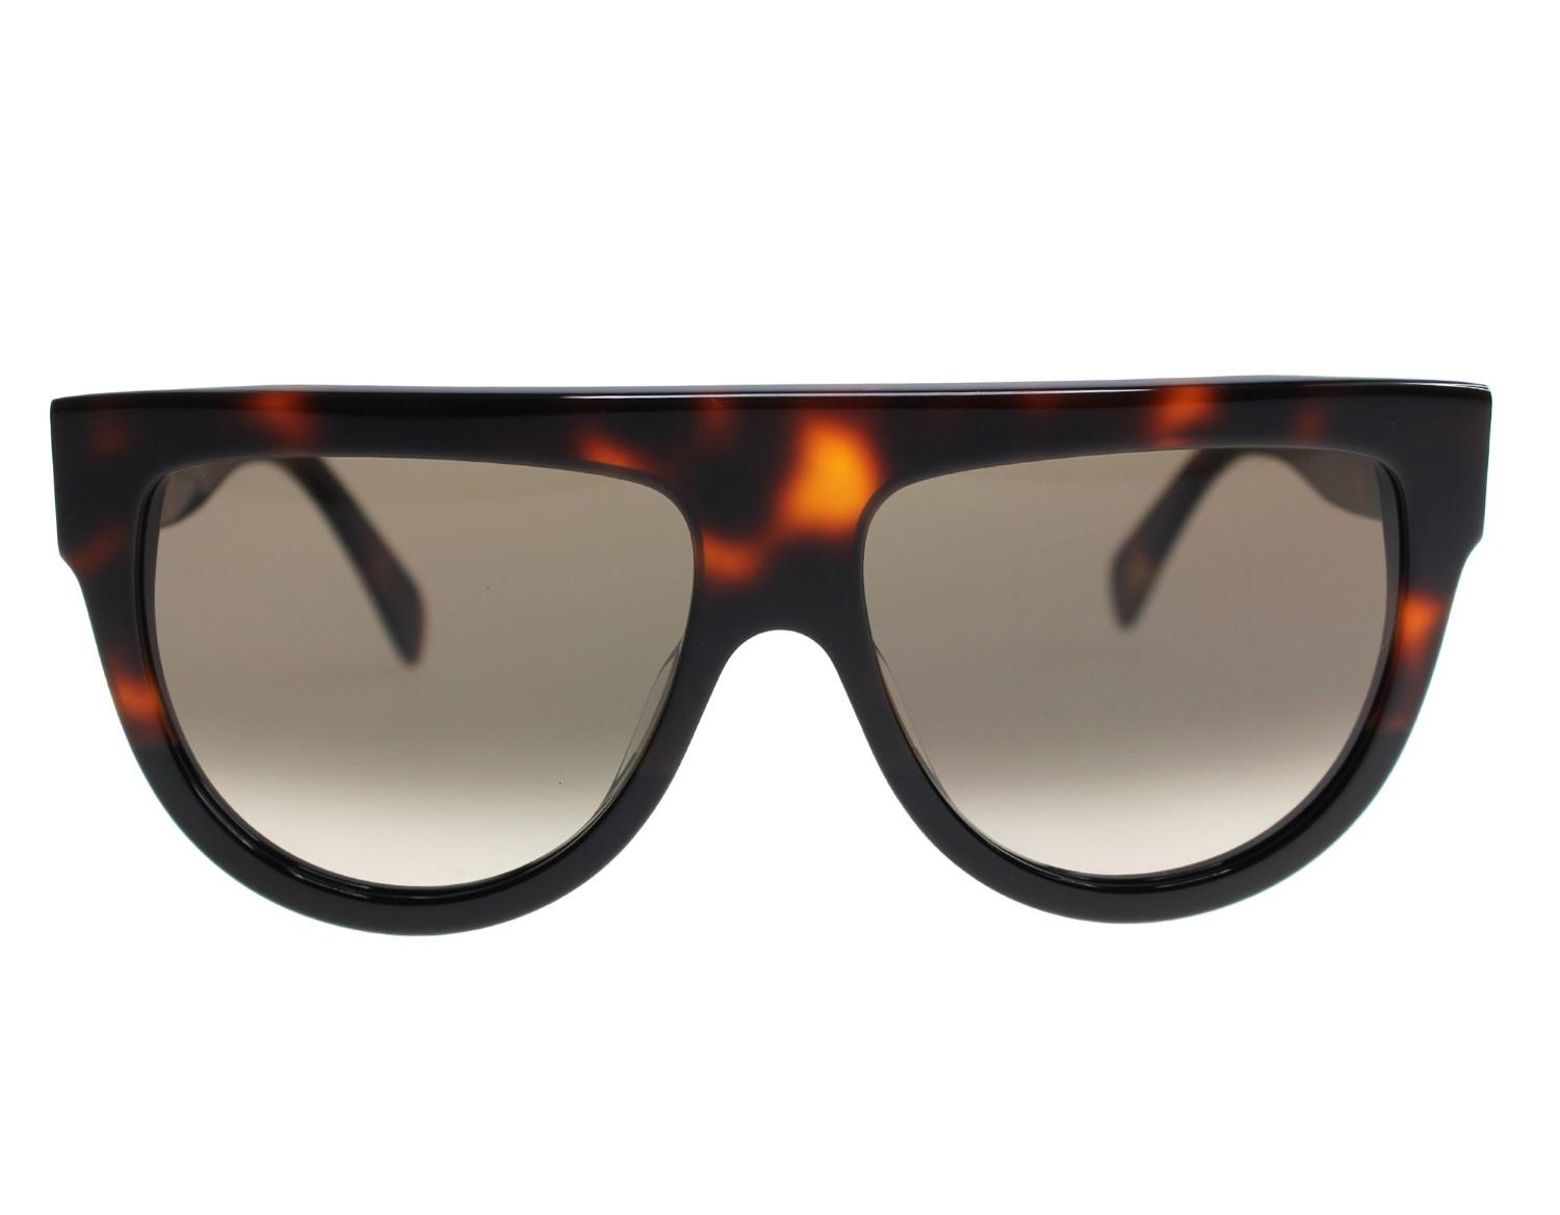 38d655bb22 Lyst - Céline Havana 41026s Aviator Sunglasses - Save 50%